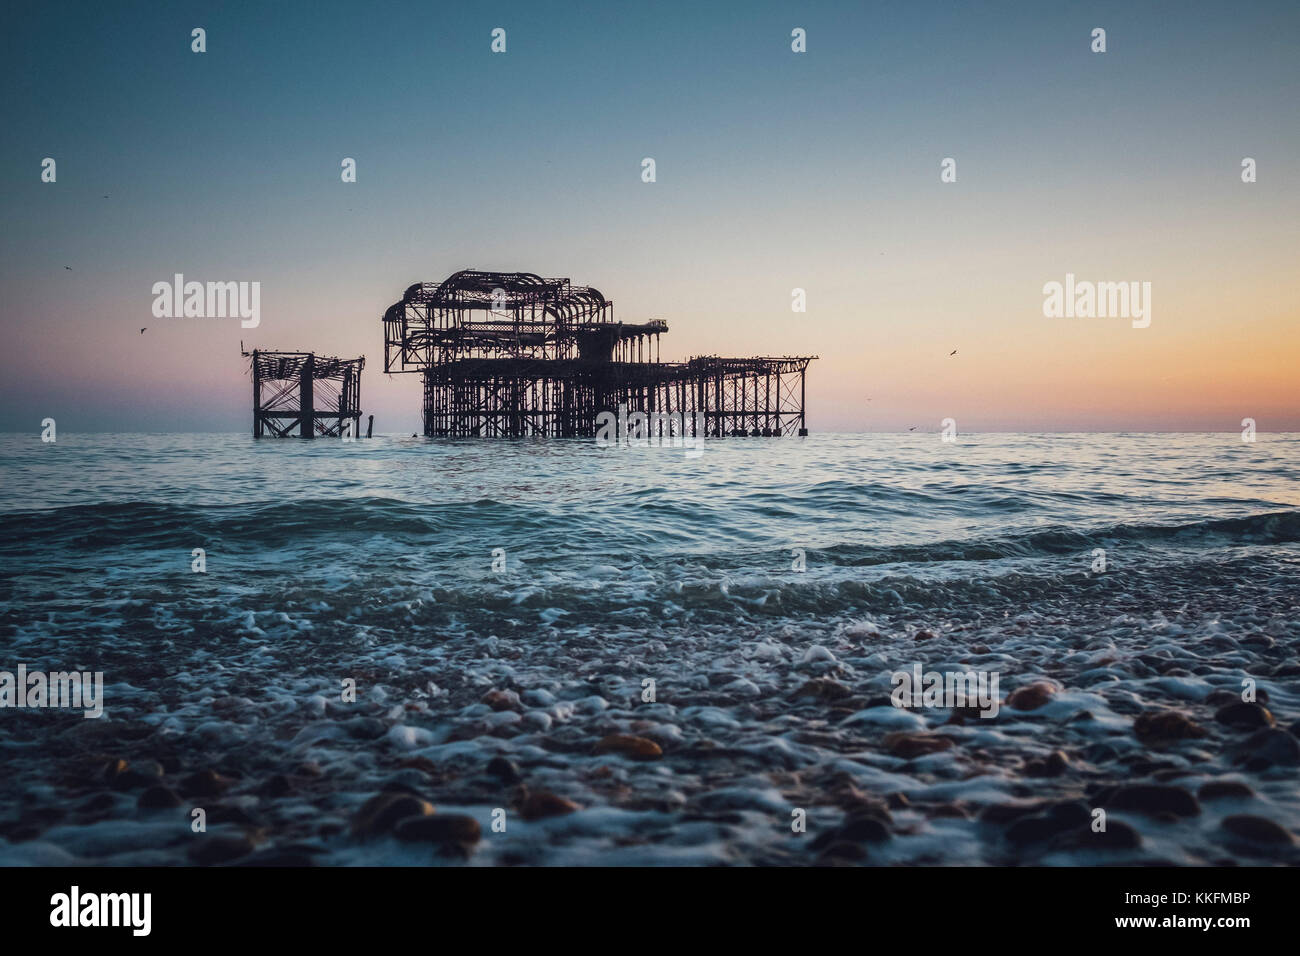 Burnt West Pier at dusk, Brighton, England - Stock Image